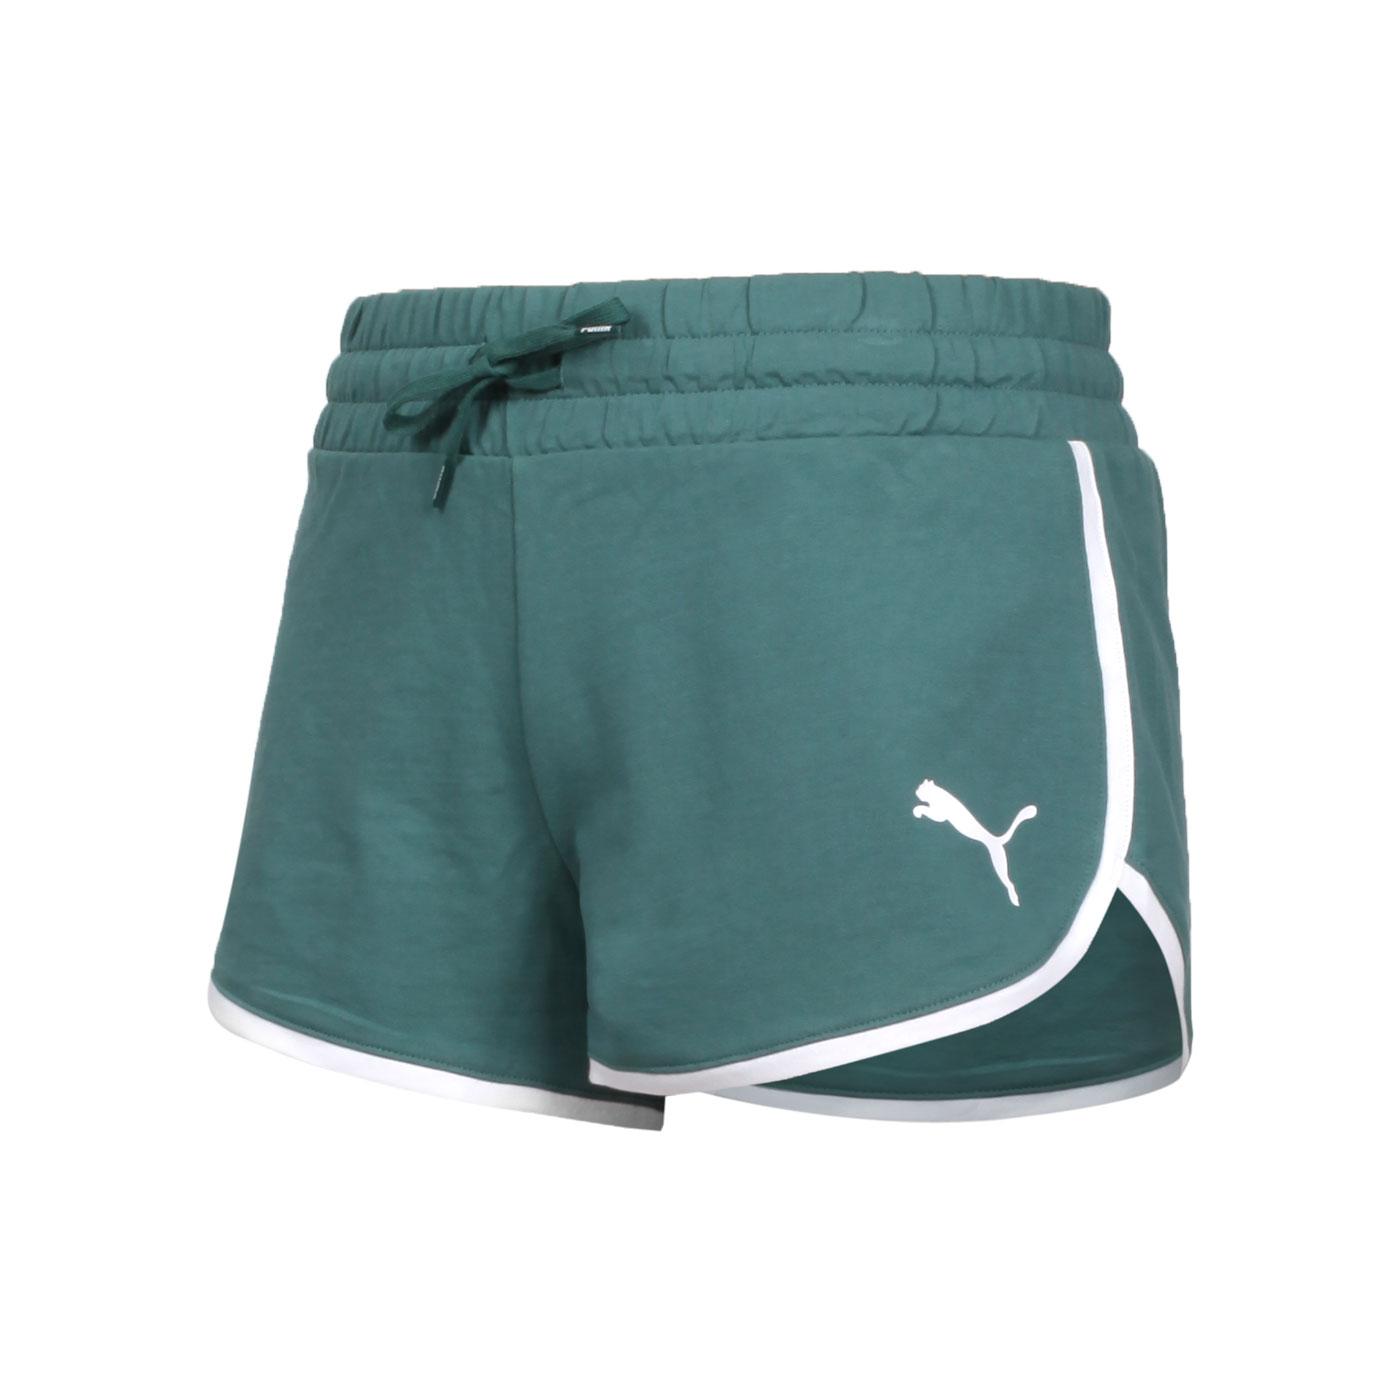 PUMA 女款基本系列Summer Stripes短褲 84582445 - 綠白